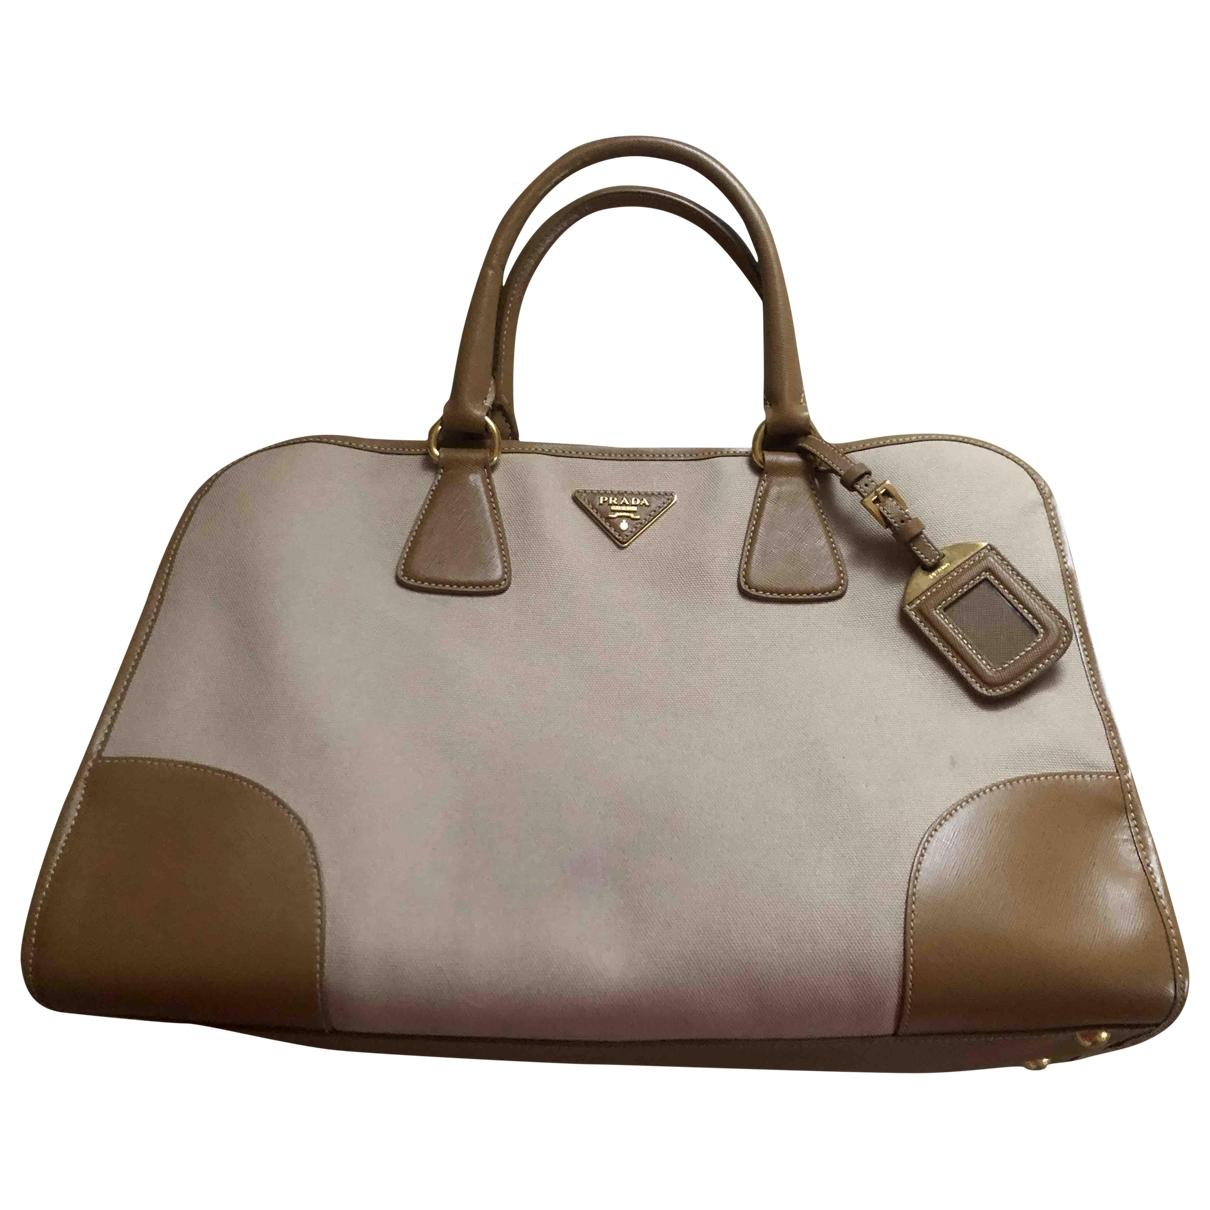 Prada \N Beige Cotton handbag for Women \N